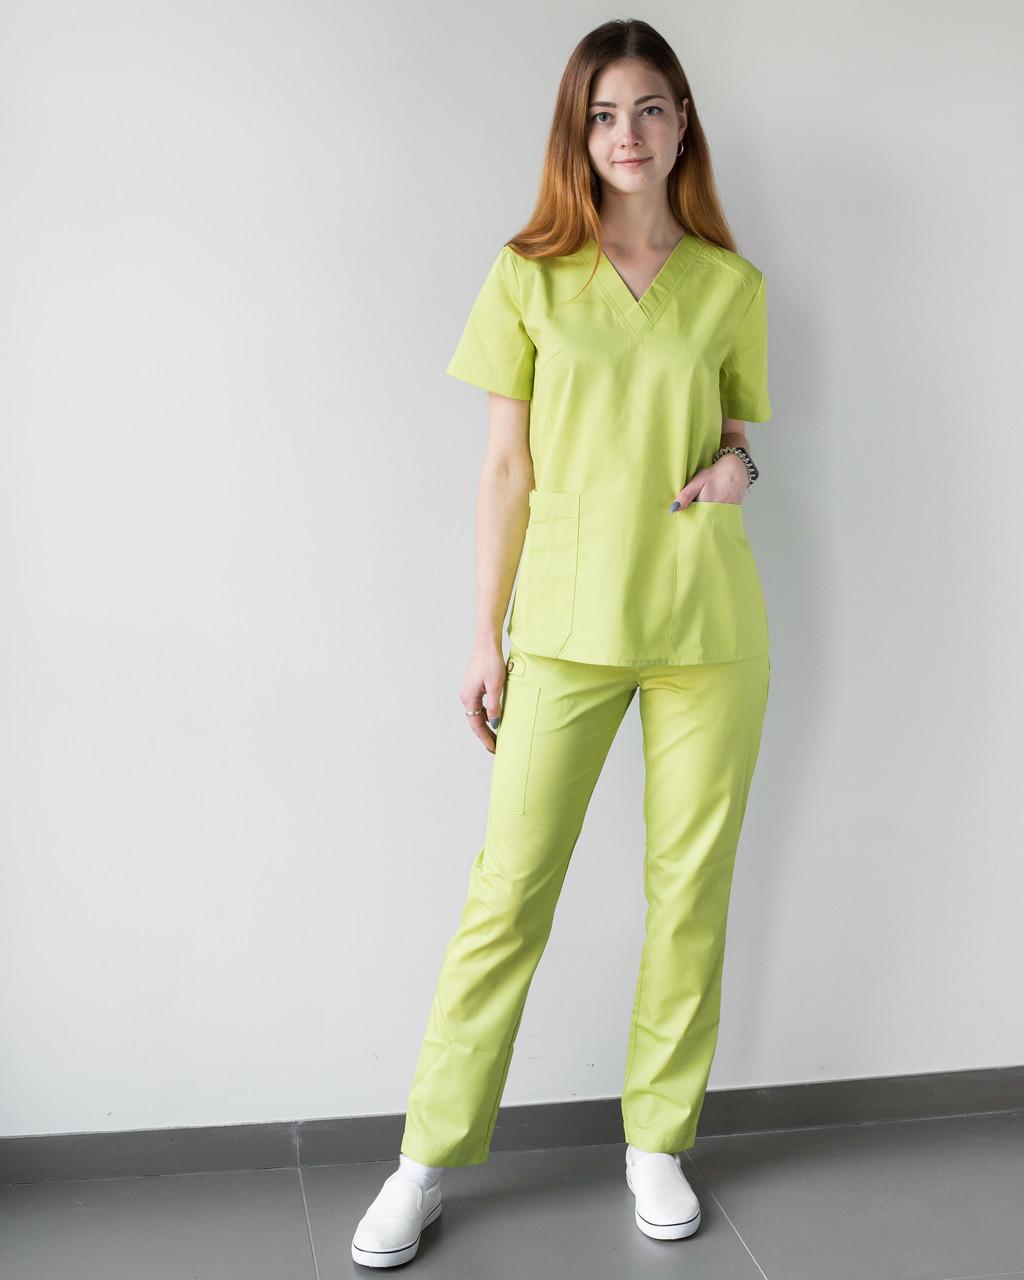 Медицинский женский костюм Toronto lime